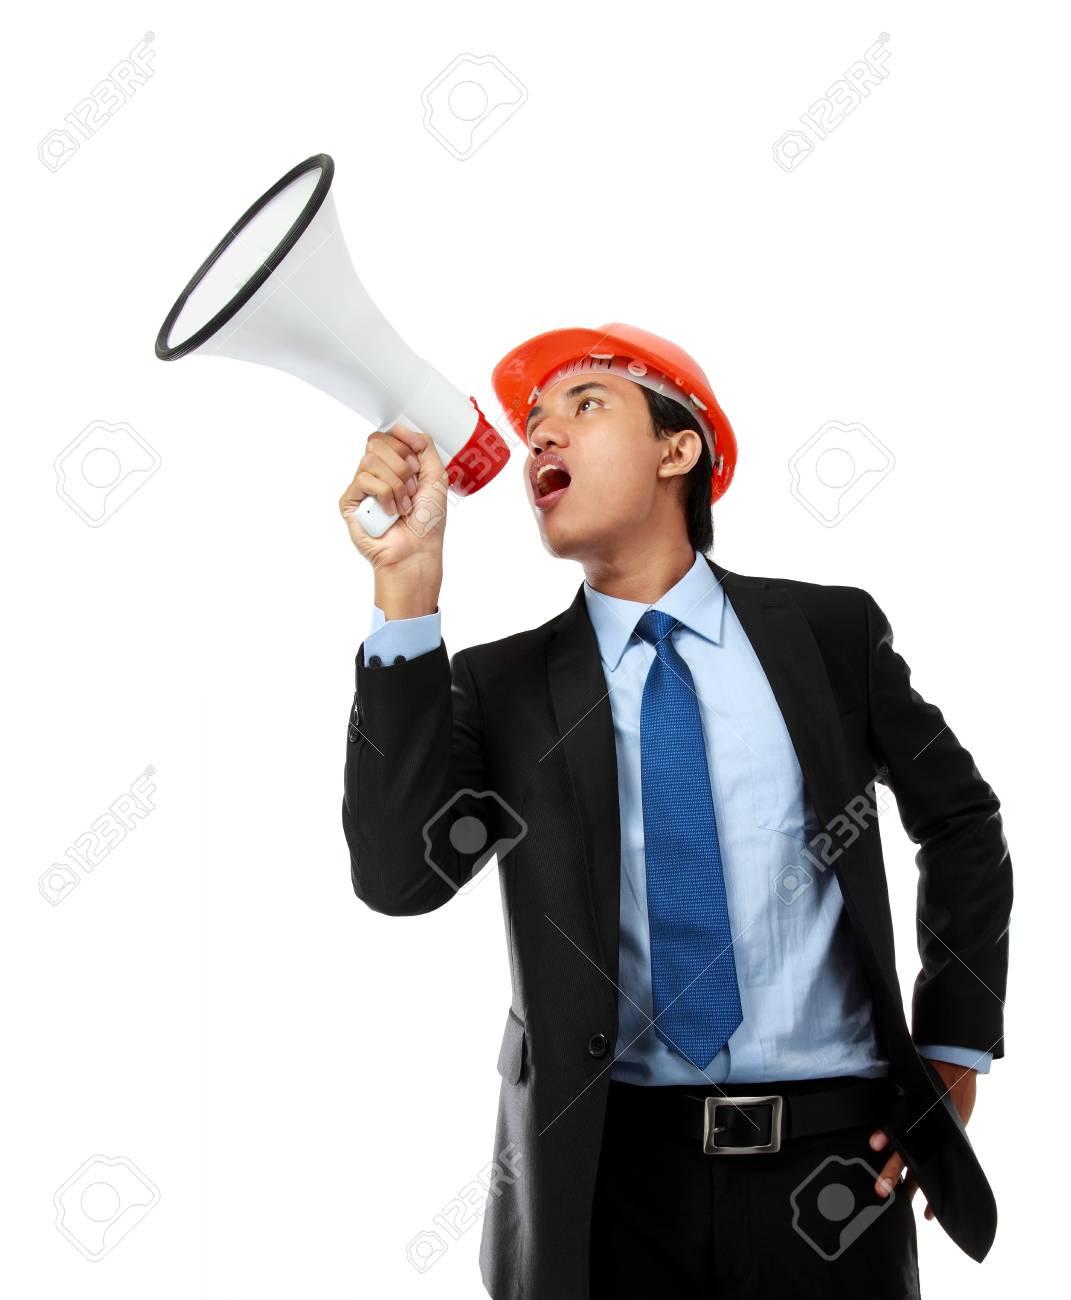 business man shouting using megaphone isolated on white background Stock Photo - 14373790